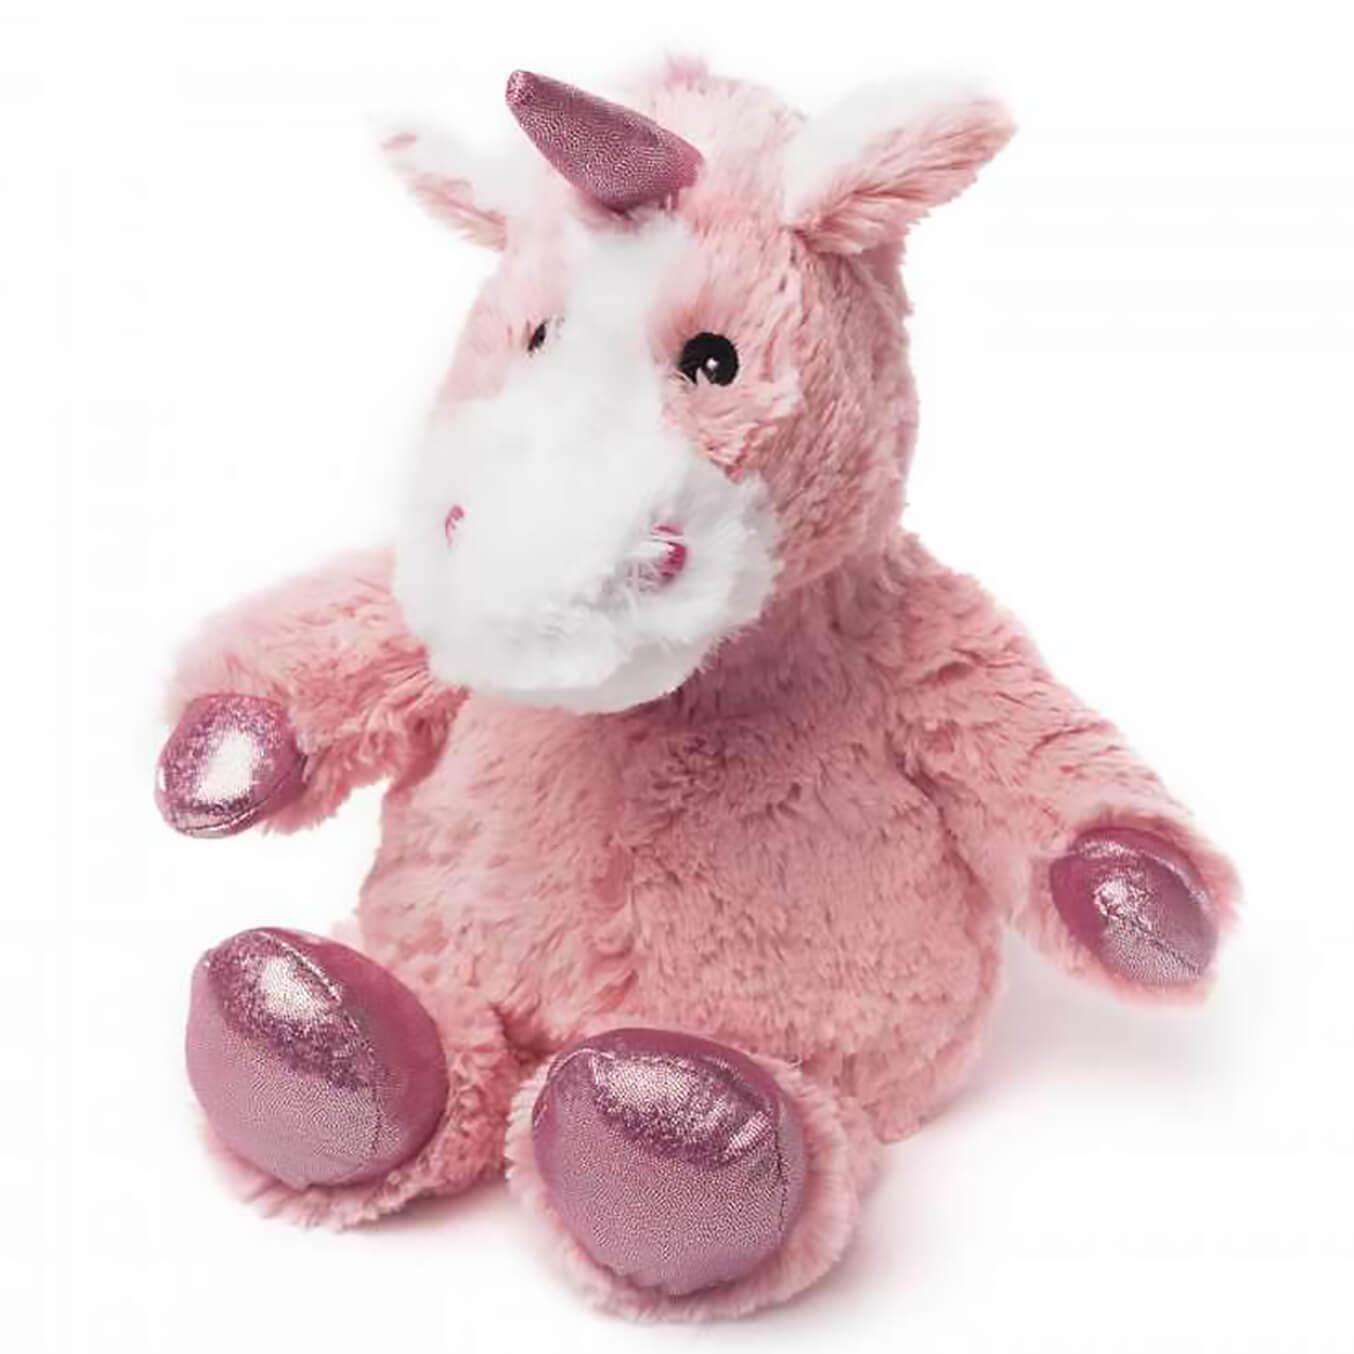 Warmies Cozy Heatable Plush Sparkly Unicorn - Pink